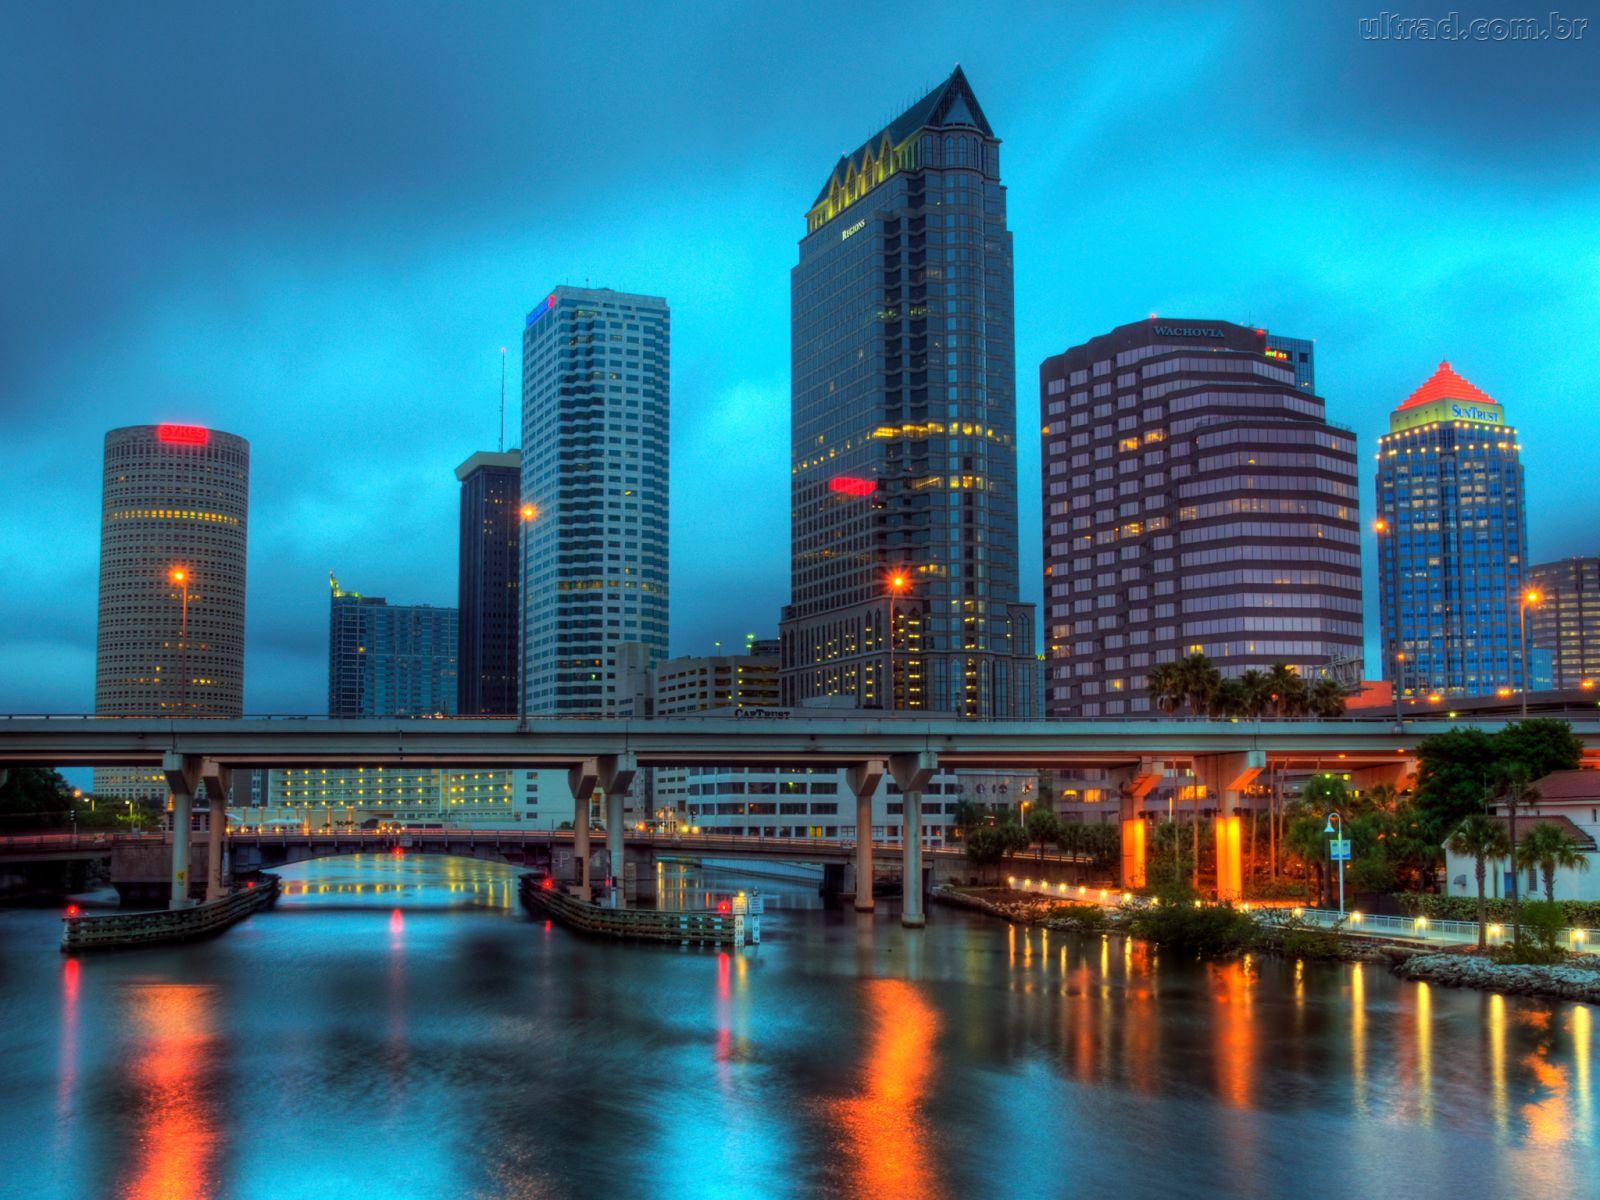 Wallpaper Clearwater Fl: Wallpaper Tampa FL